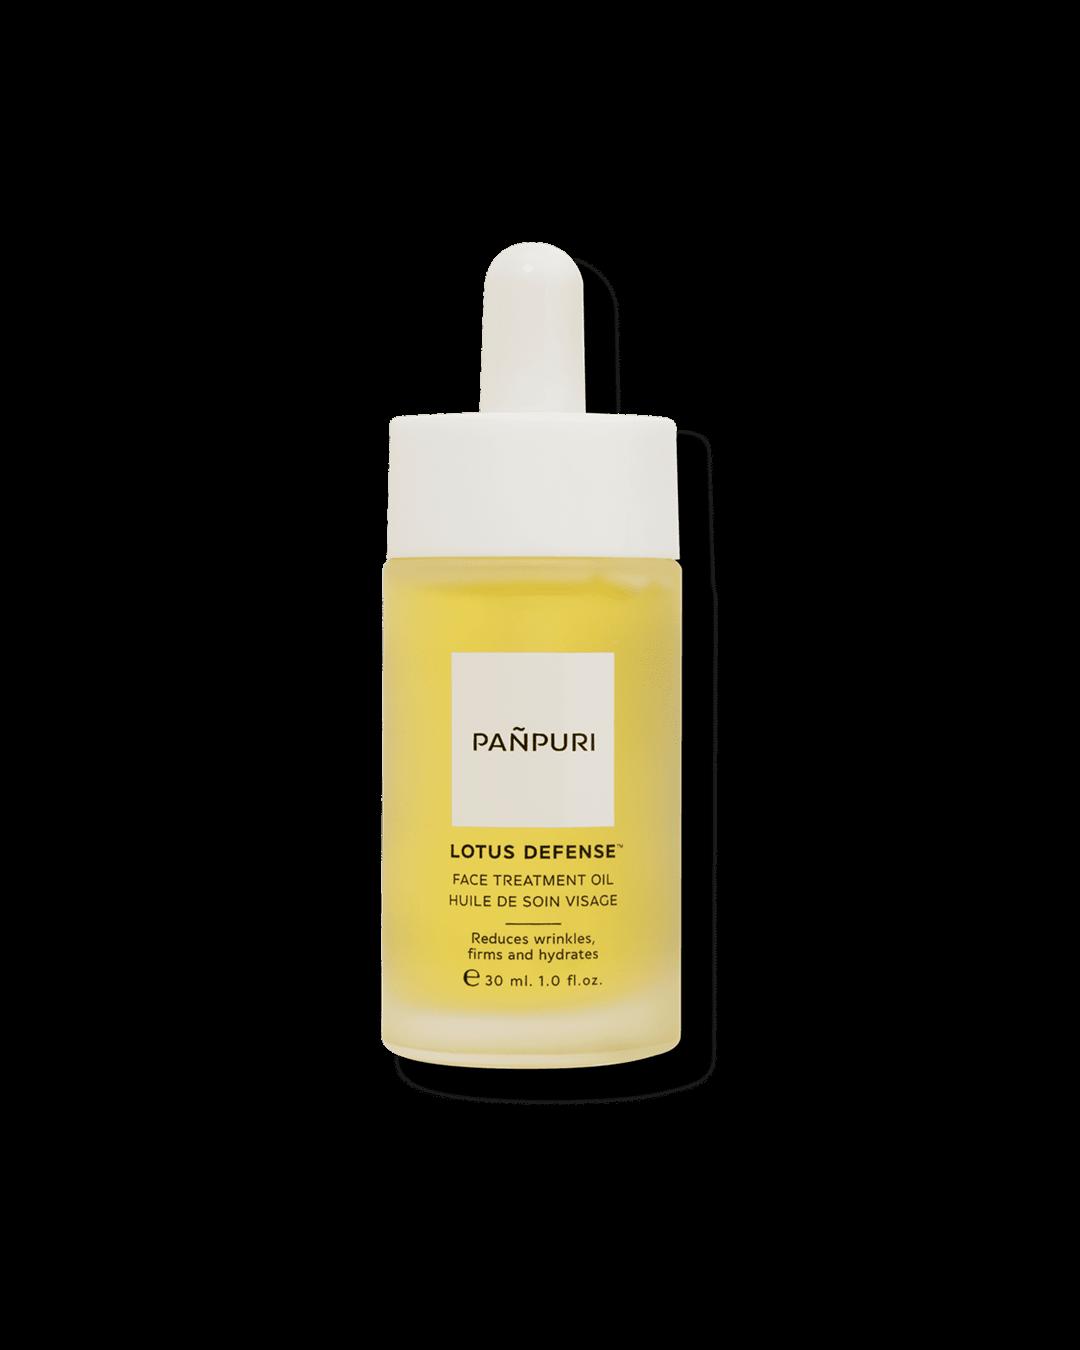 Face Treatment Oil